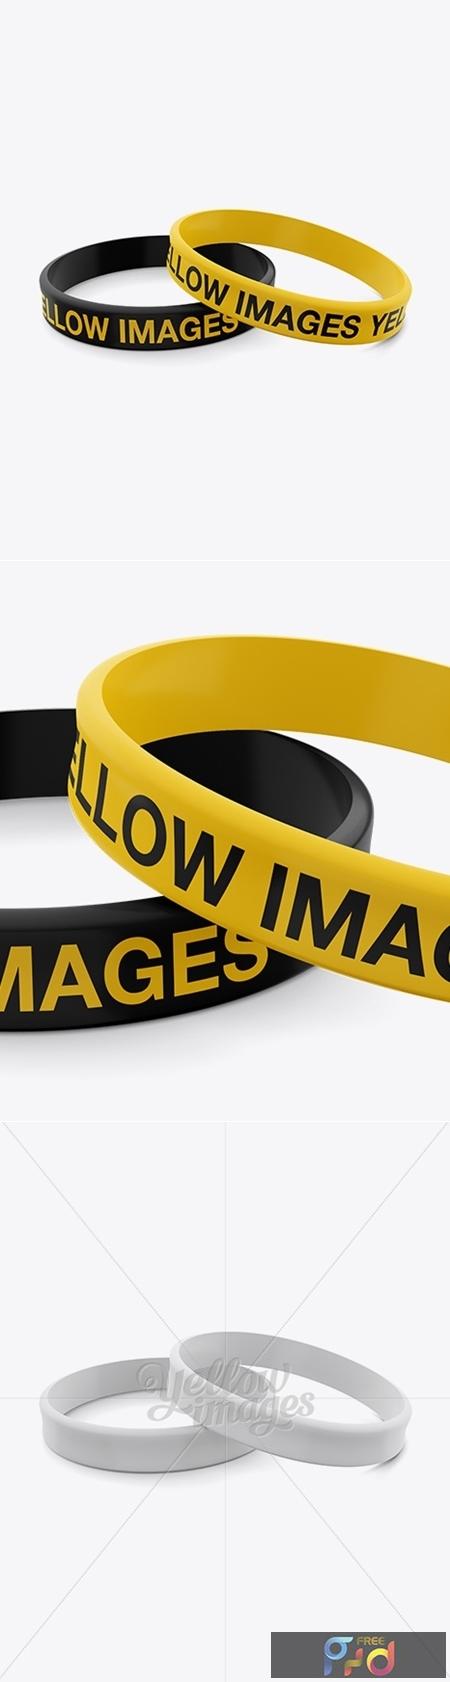 Silicone Wristbands Mockup 12393 1